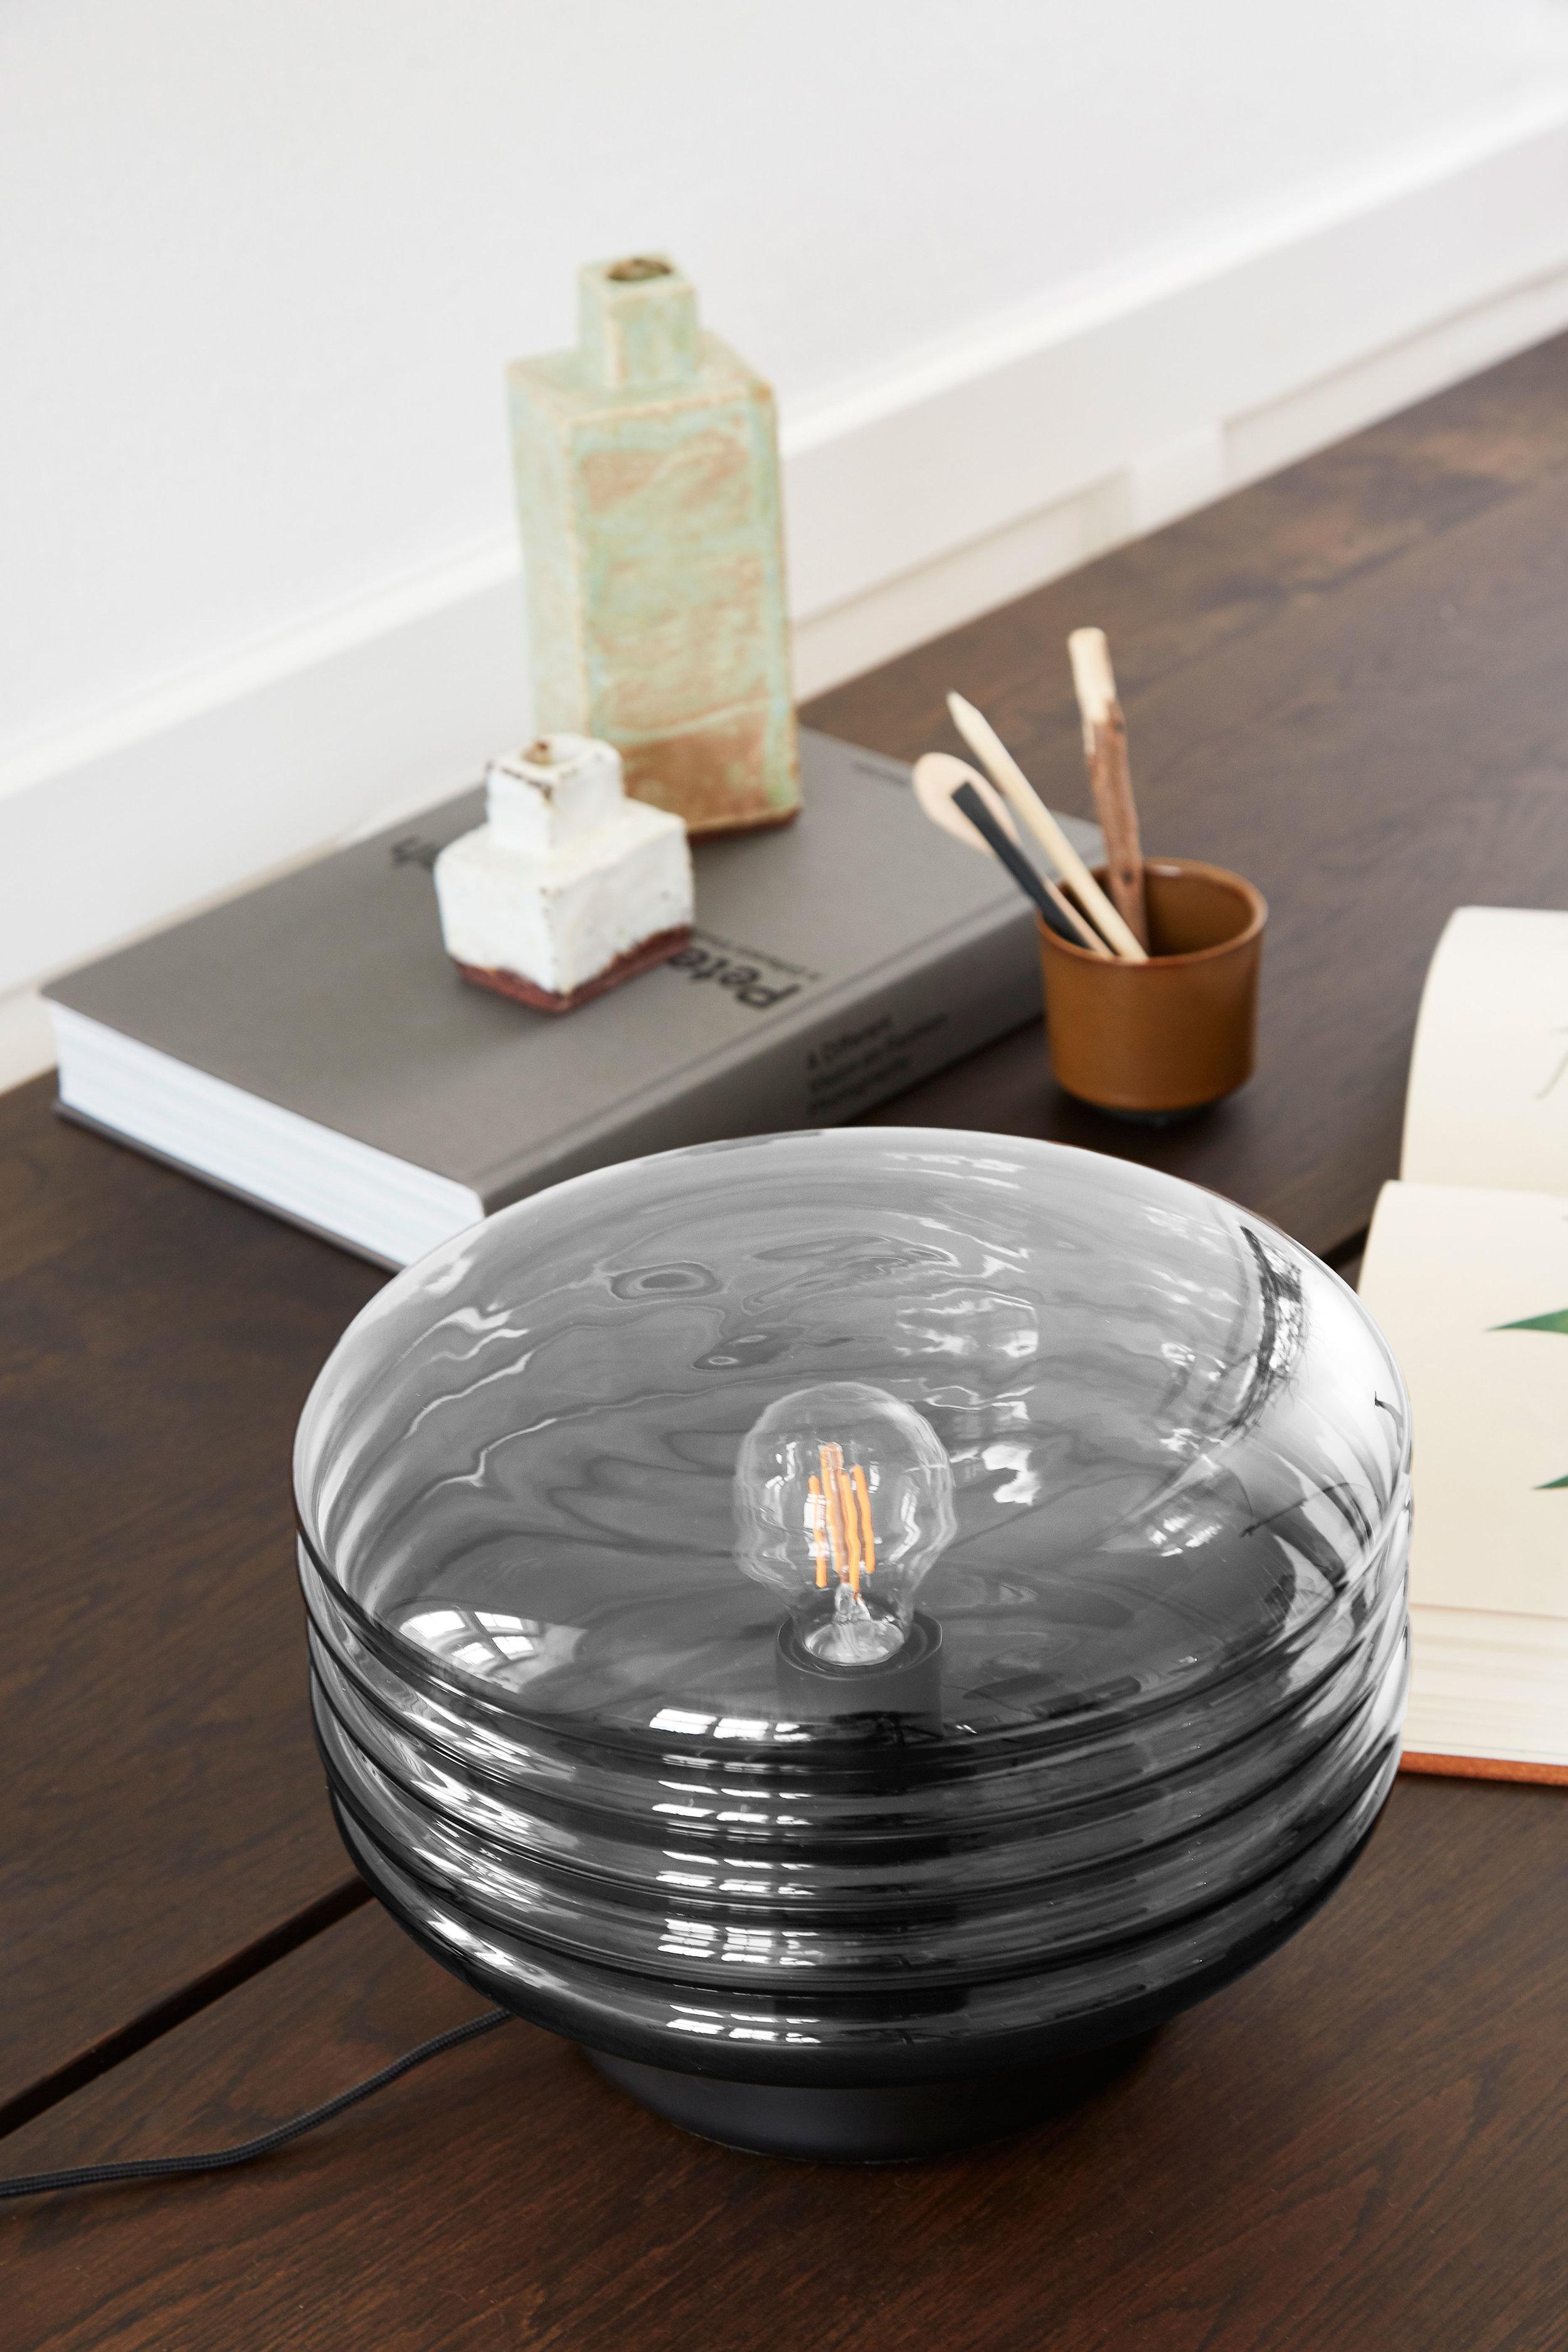 Glass table lamp. Dimensions: ø30 cm | H25 cm Variants: Smoke glass Designer: Frandsen Design Studio    MORE